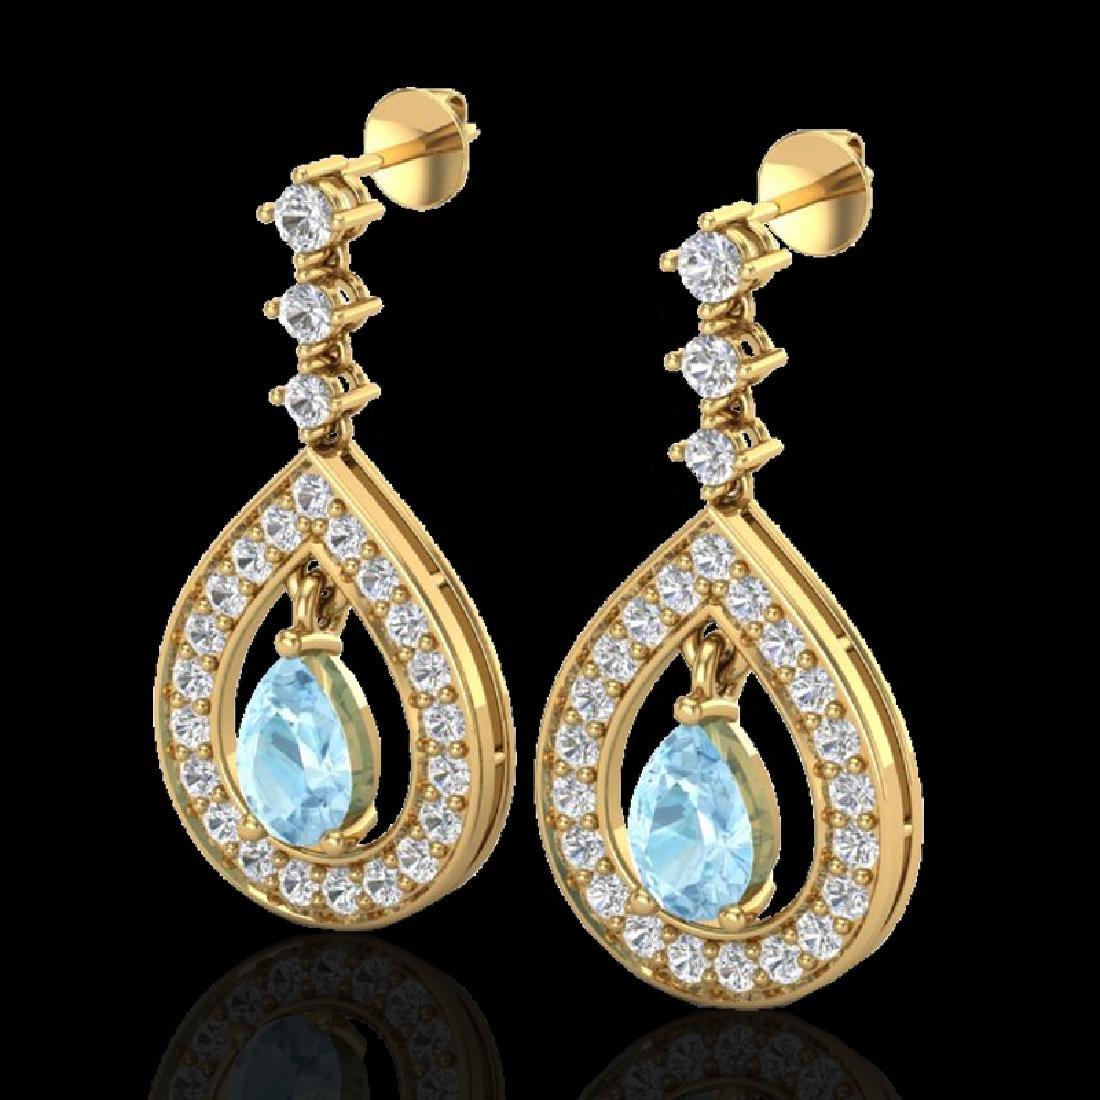 2.25 CTW Aquamarine & Micro Pave VS/SI Diamond Earrings